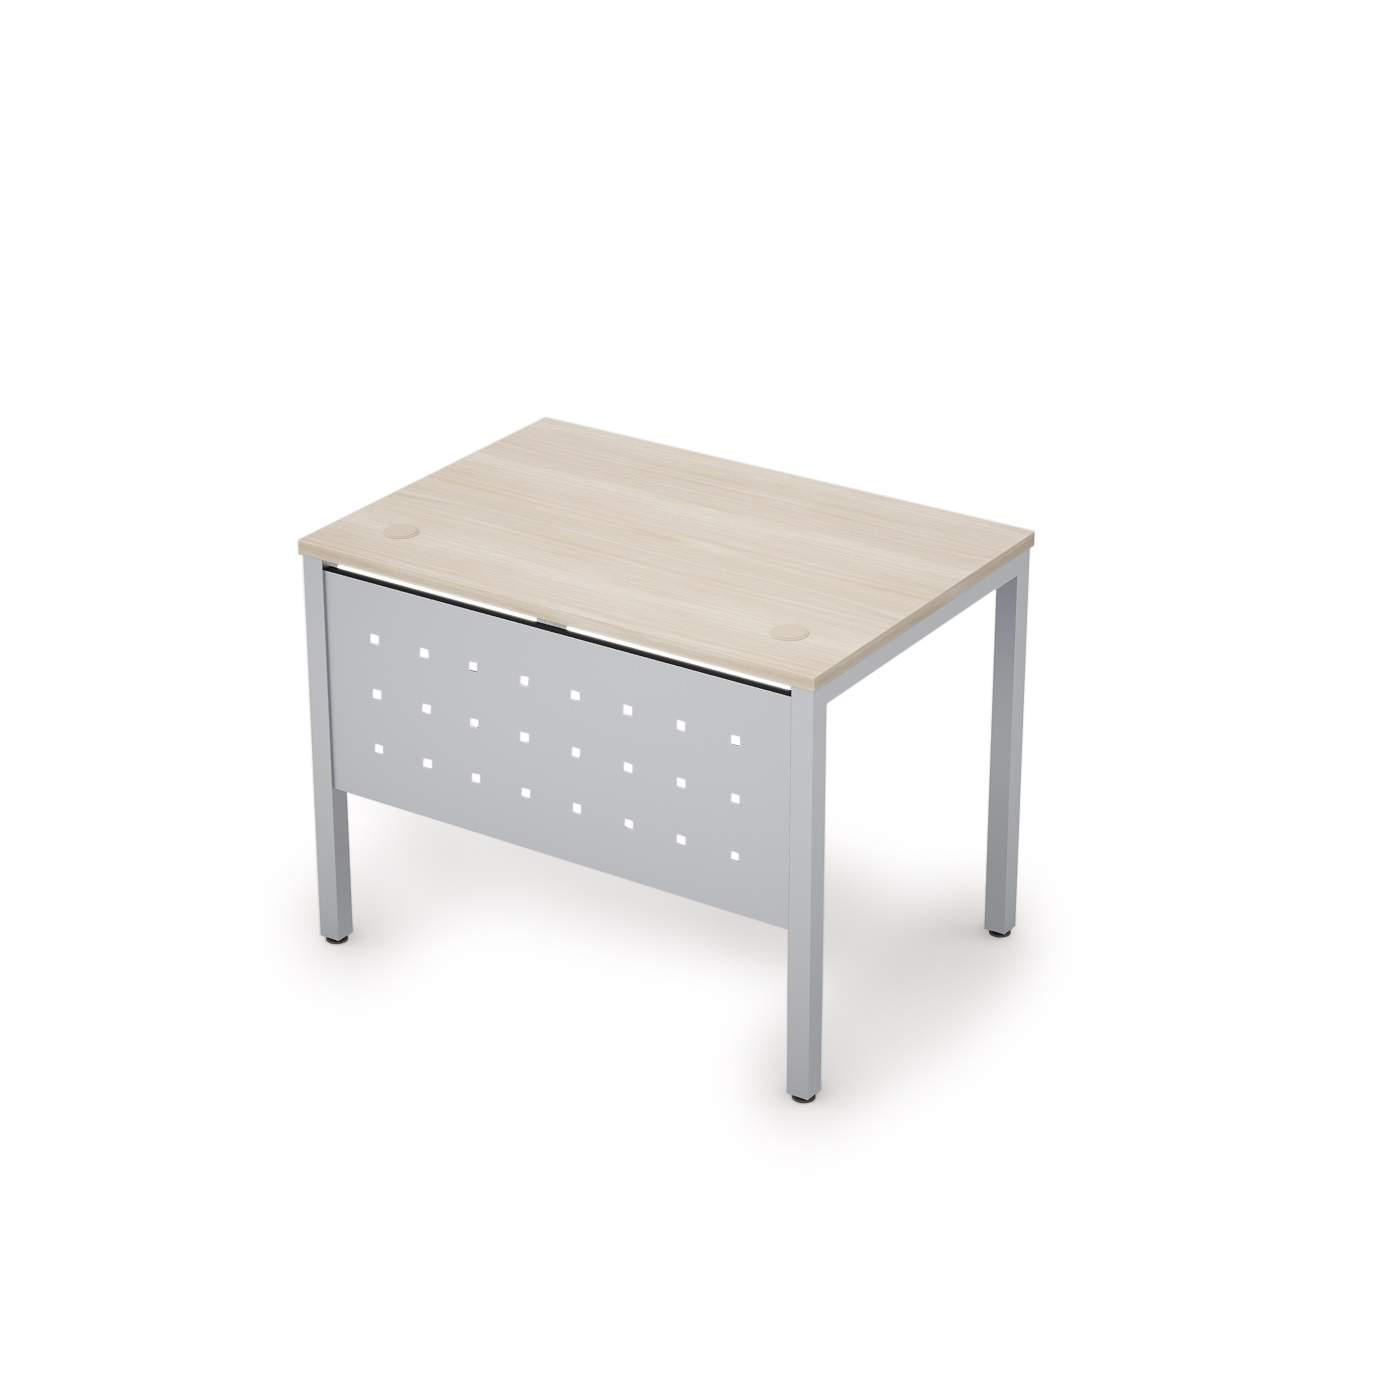 Стол с экраном из металла 1000х700х750